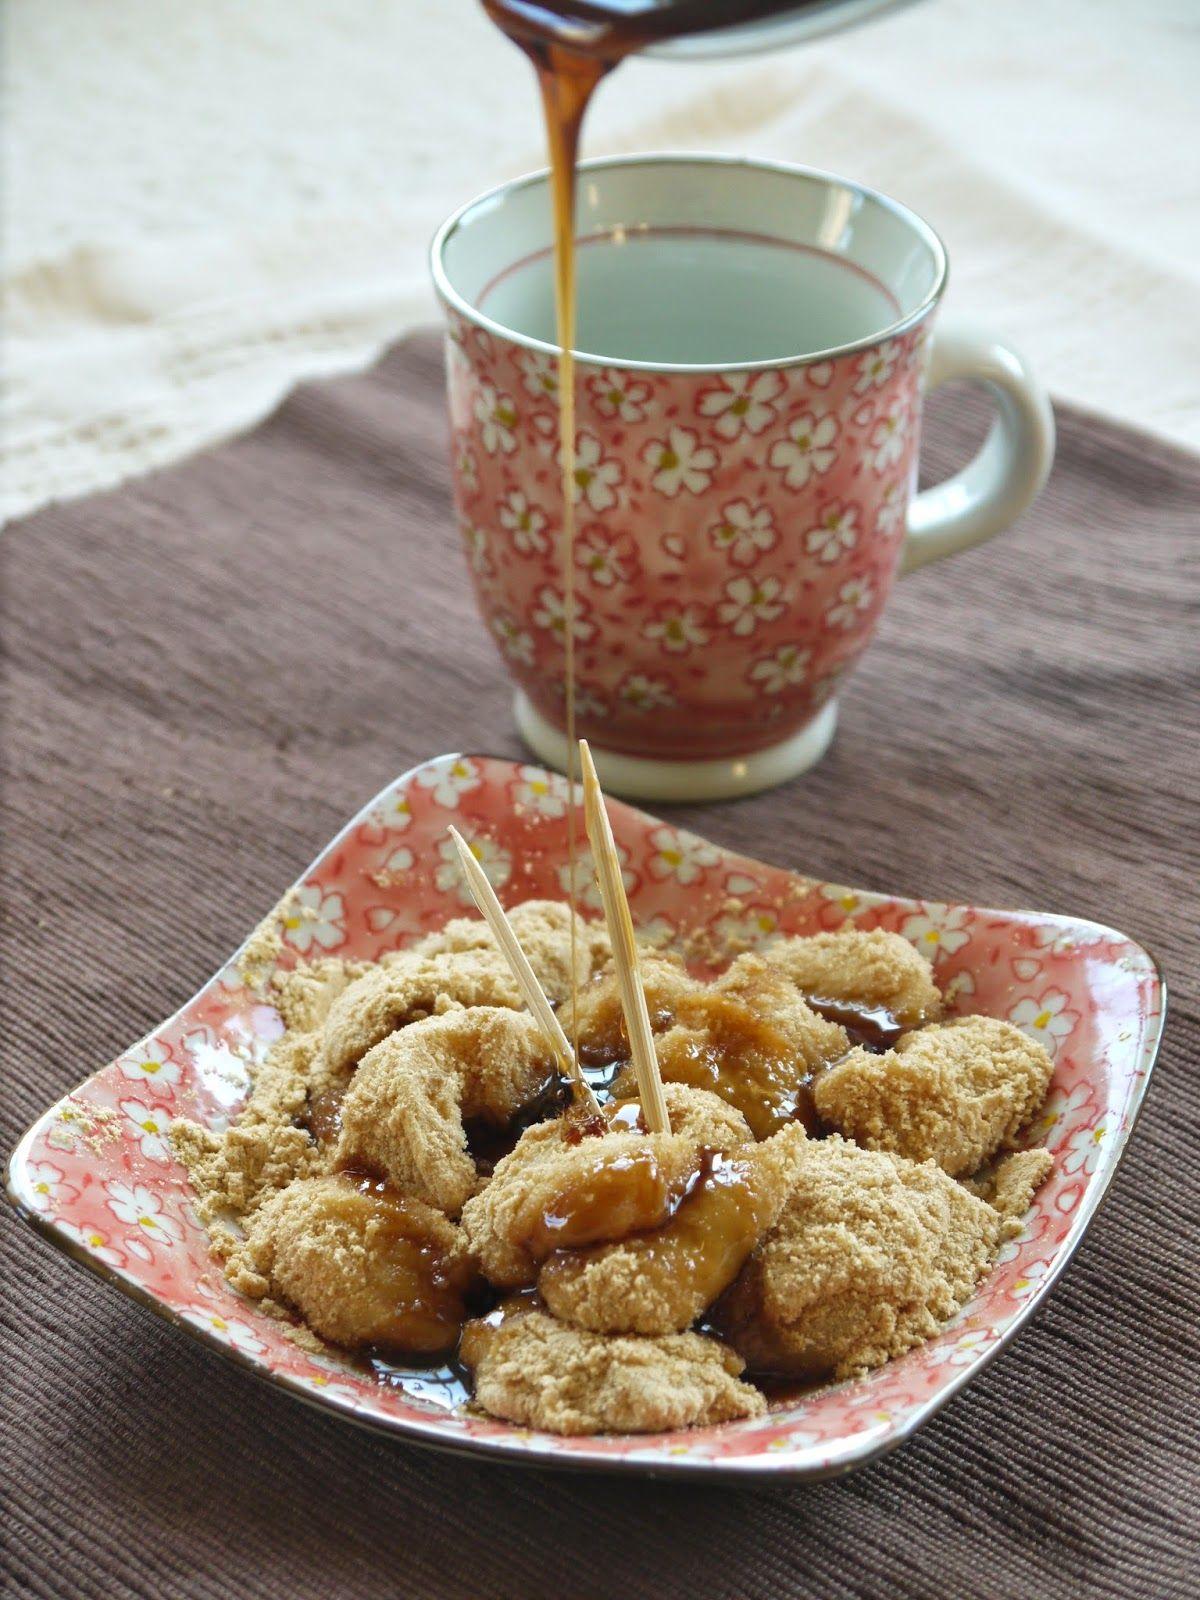 TGIB - Thank God I Bake | Food, Asian desserts, Mochi recipe